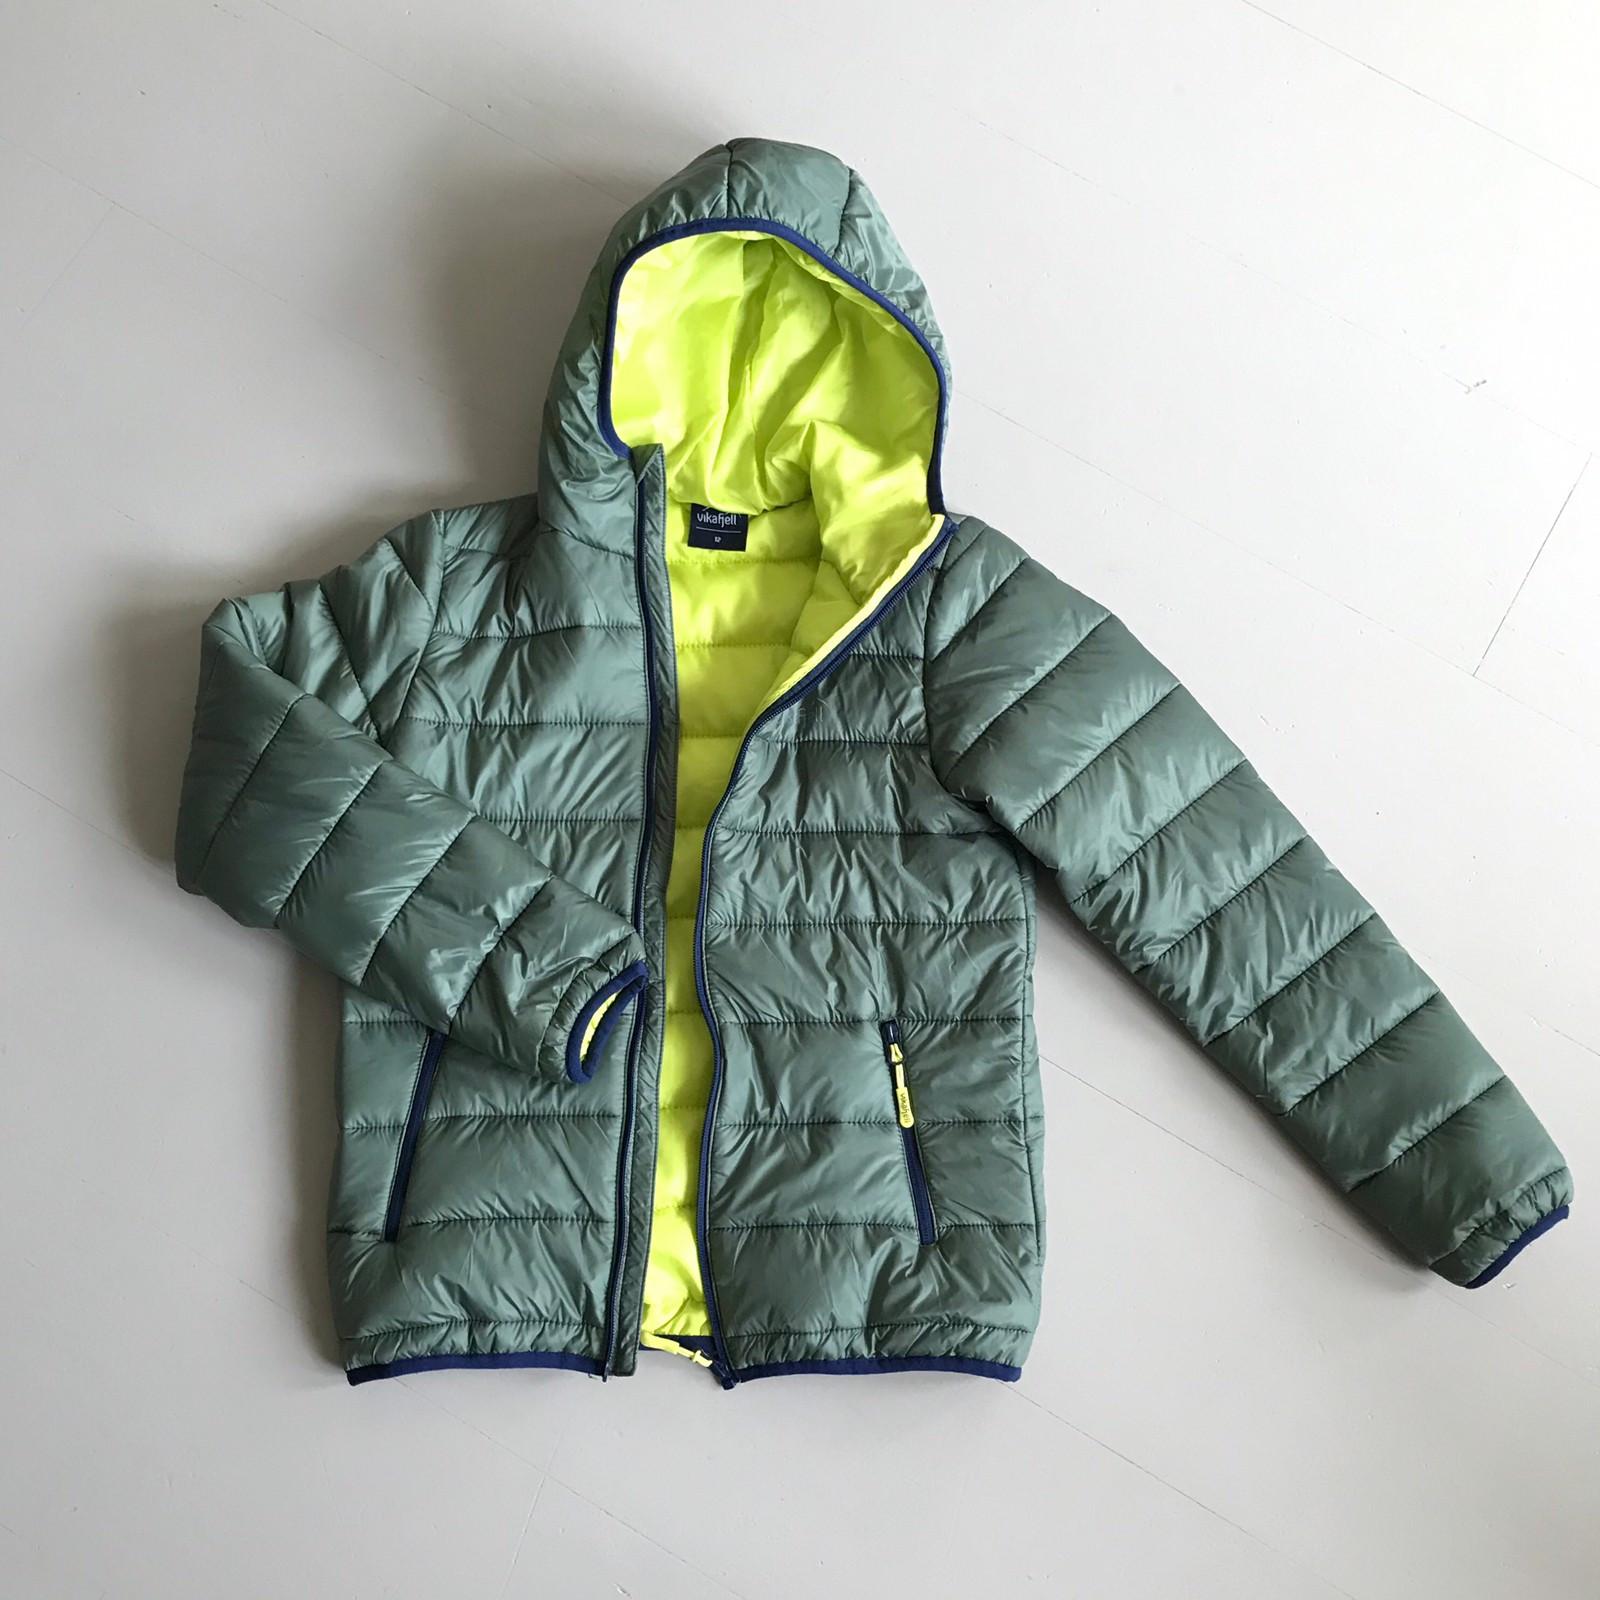 Vikafjell Vatts jakke